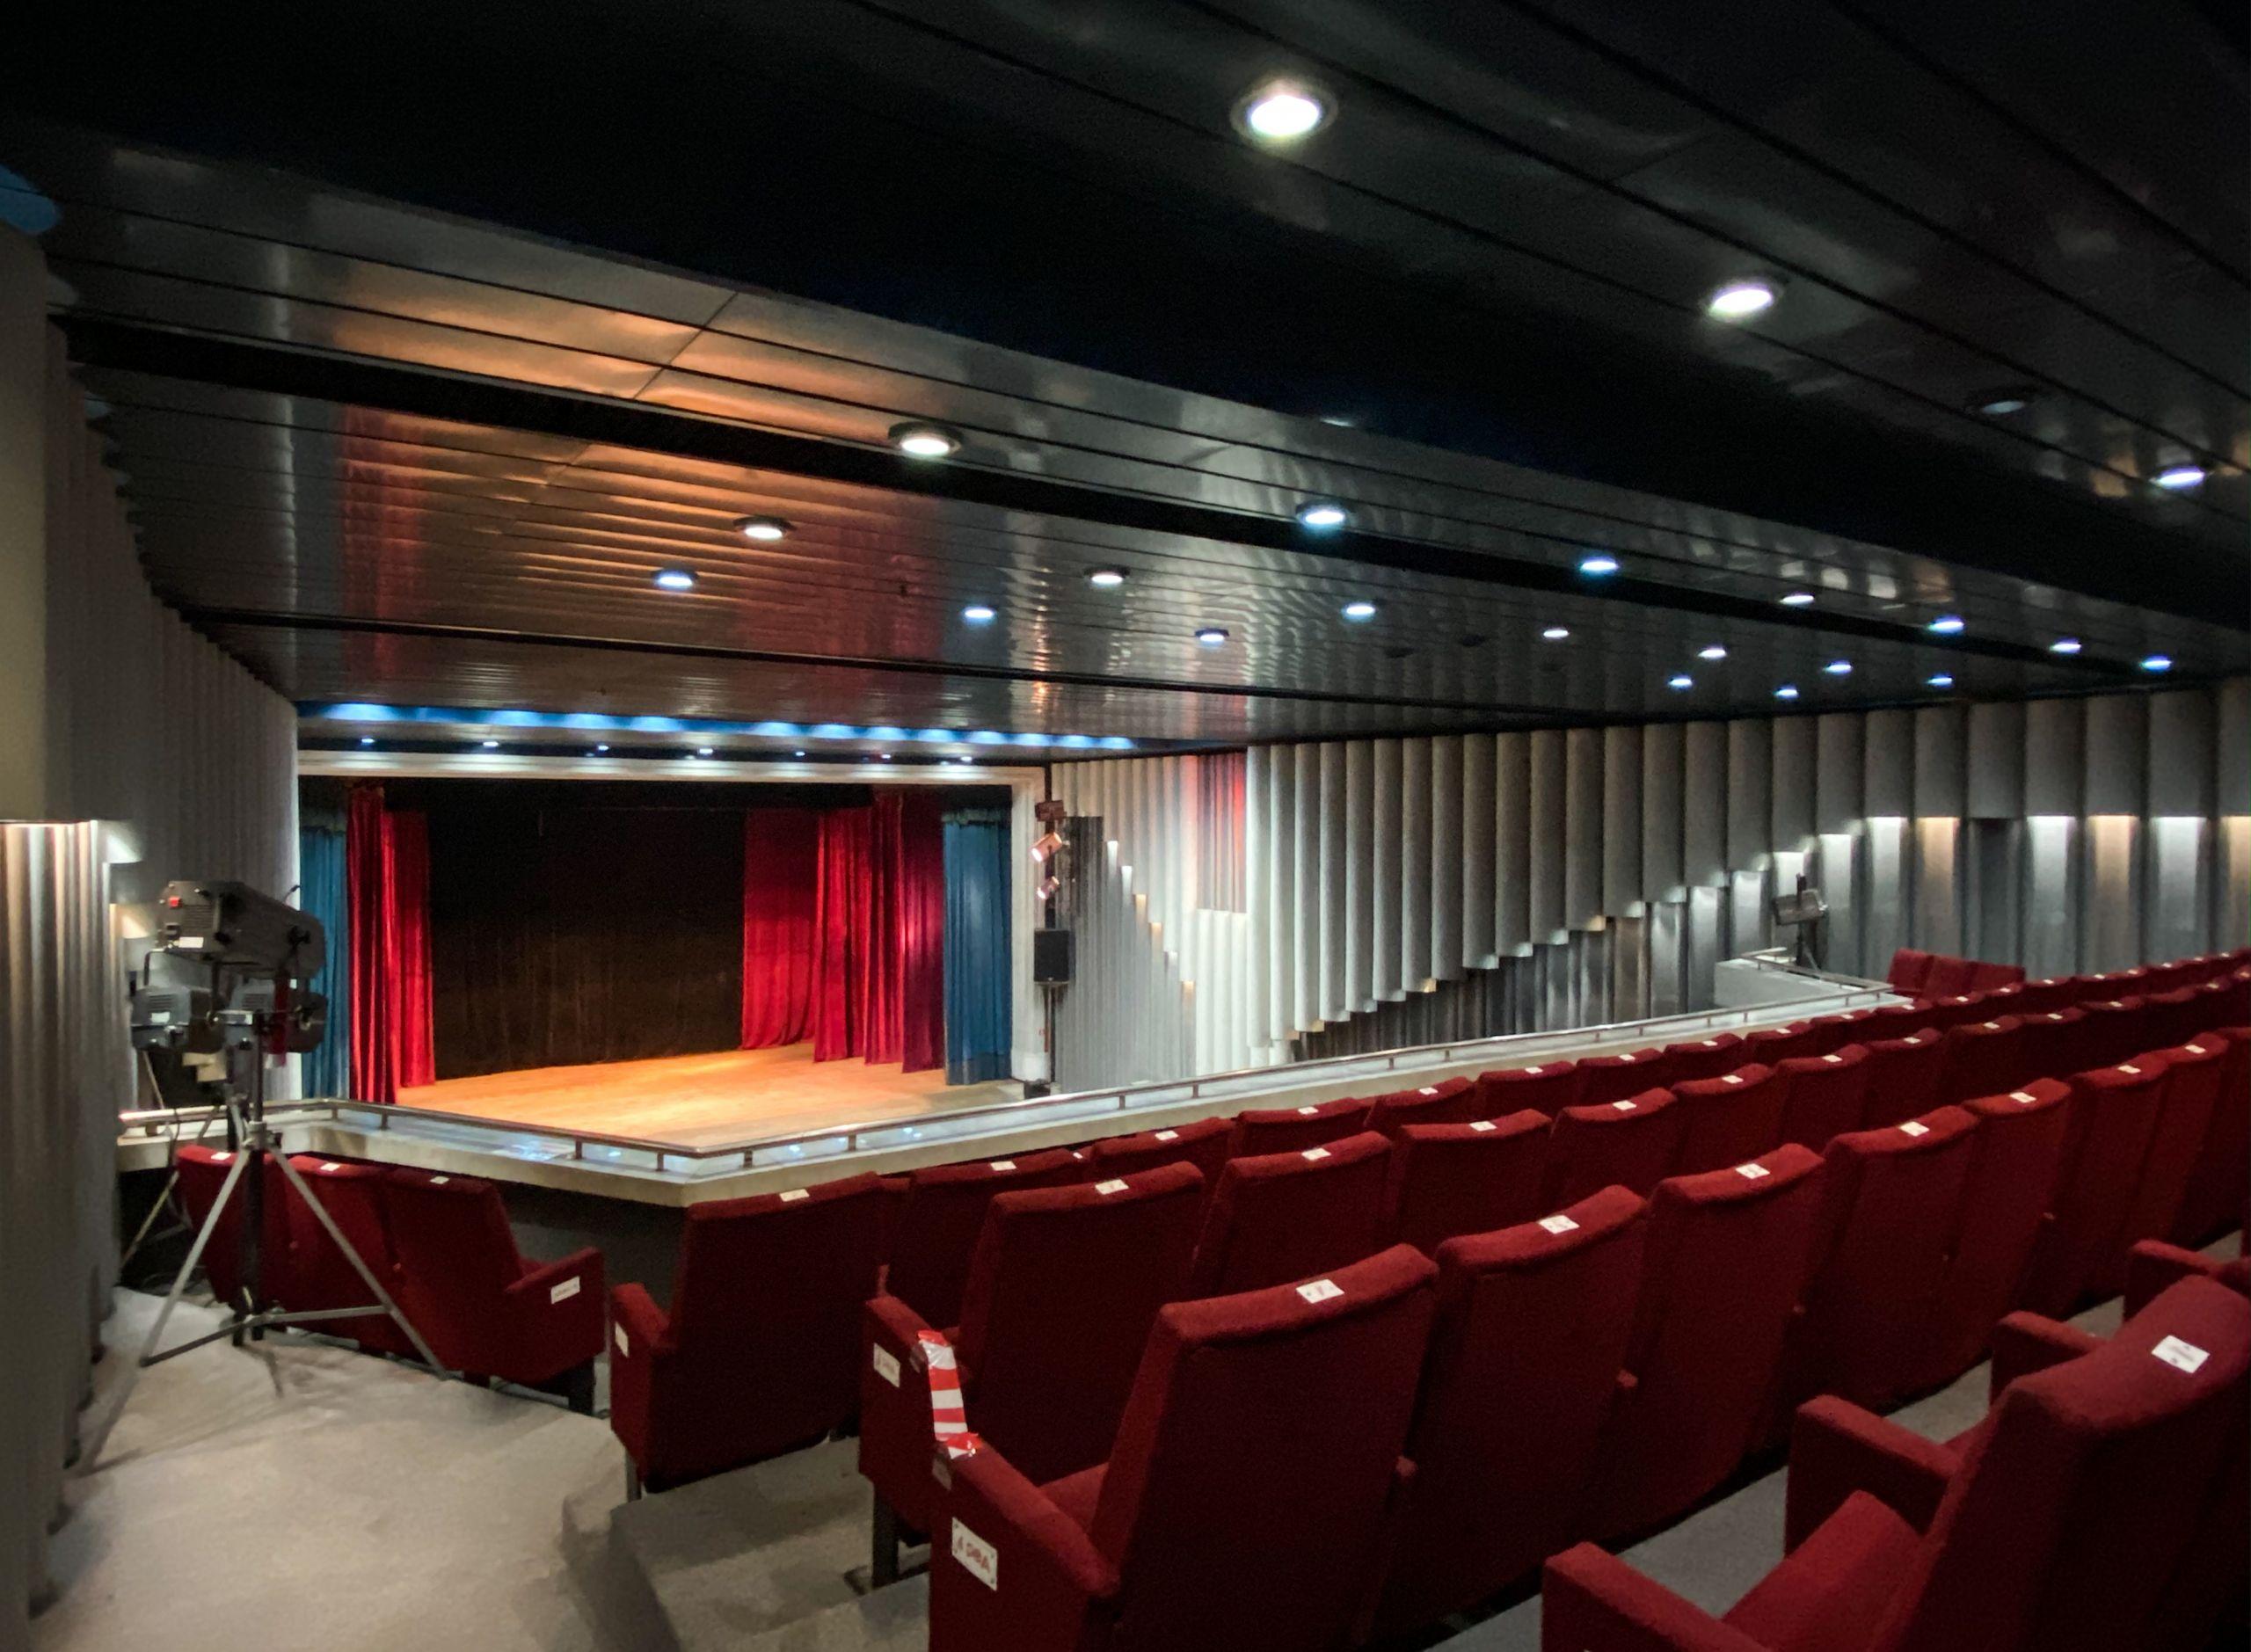 Kino Teatur Osvobojdenie 13